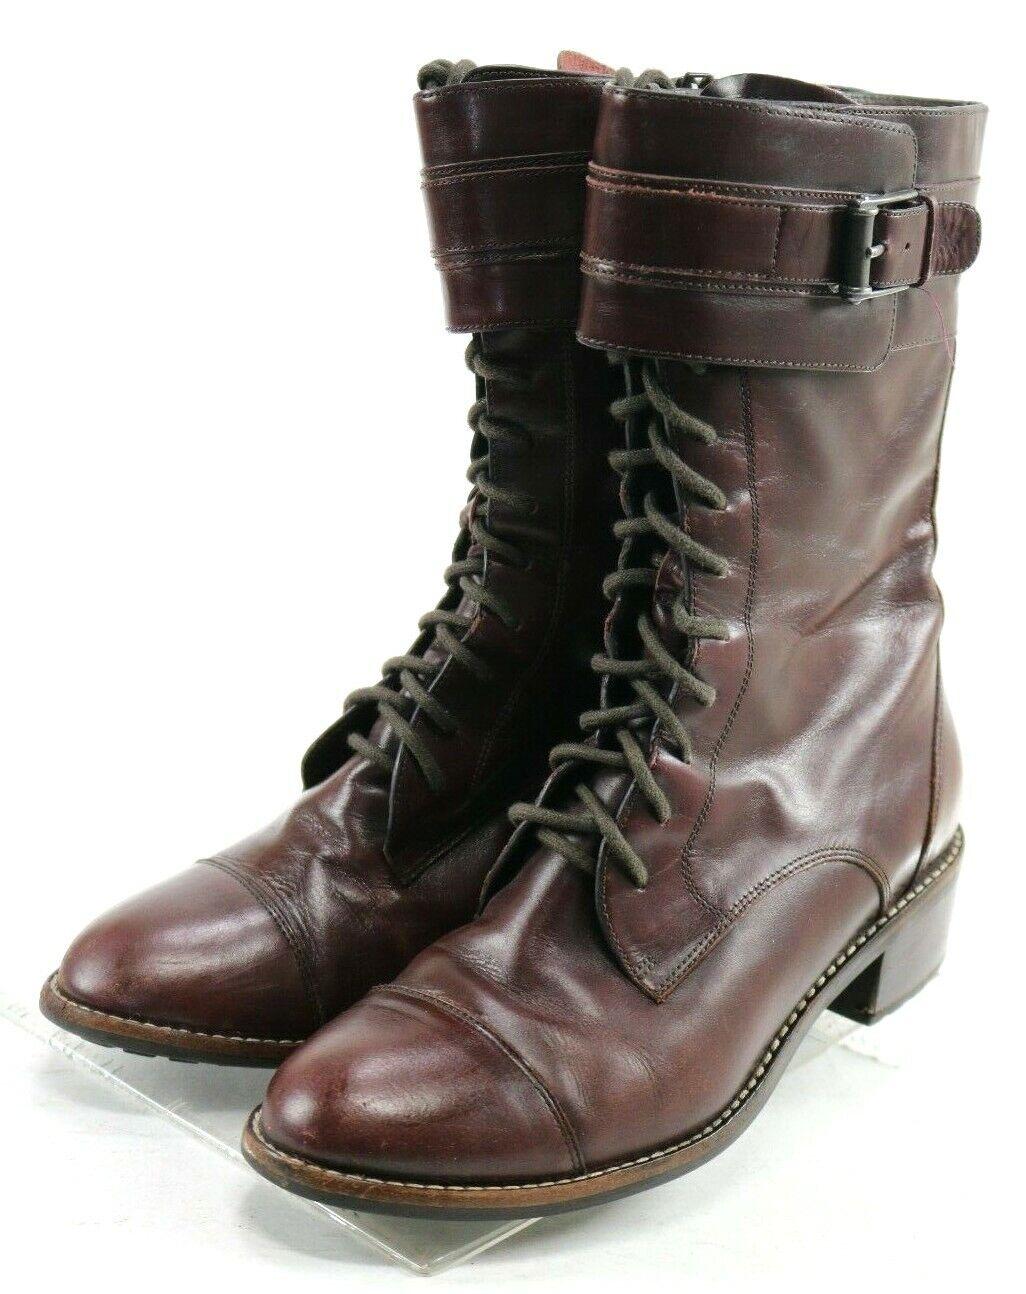 Cole Haan NIK Air  140 Women's Cap Toe Boots Size 7.5 Leather Burgundy